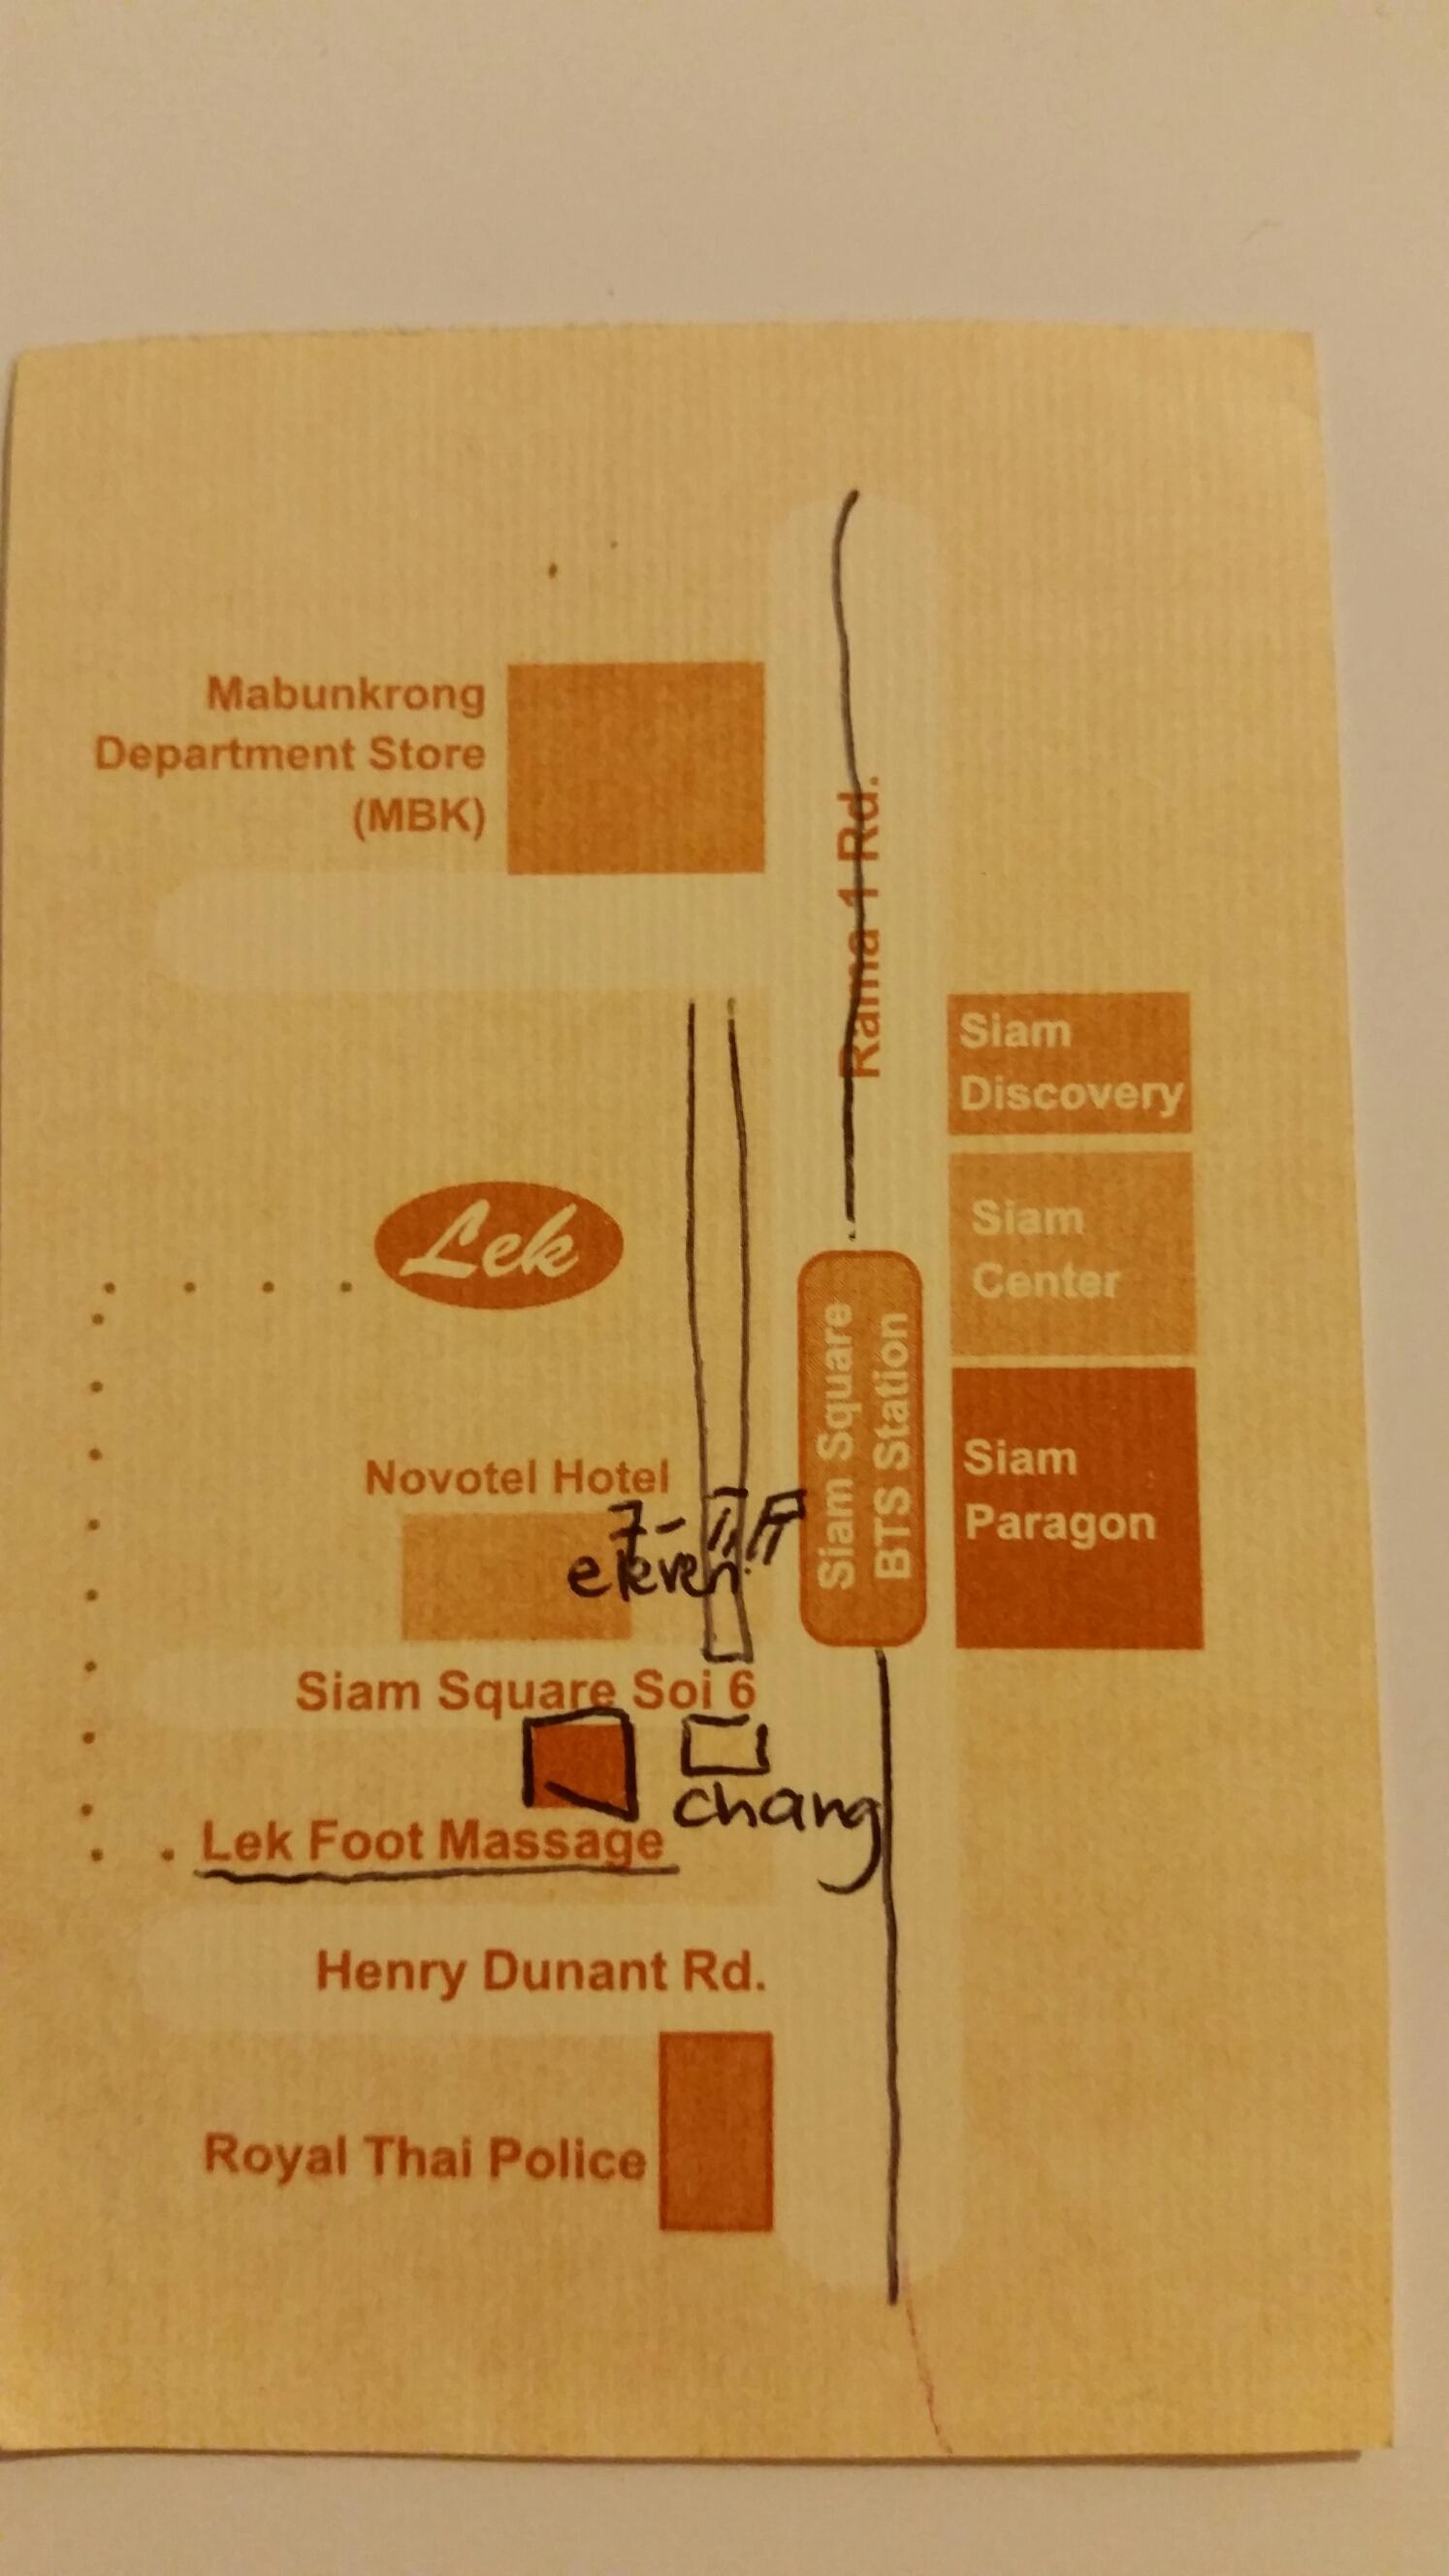 Chang Foot Massage Jerms Bbs Diagram Image